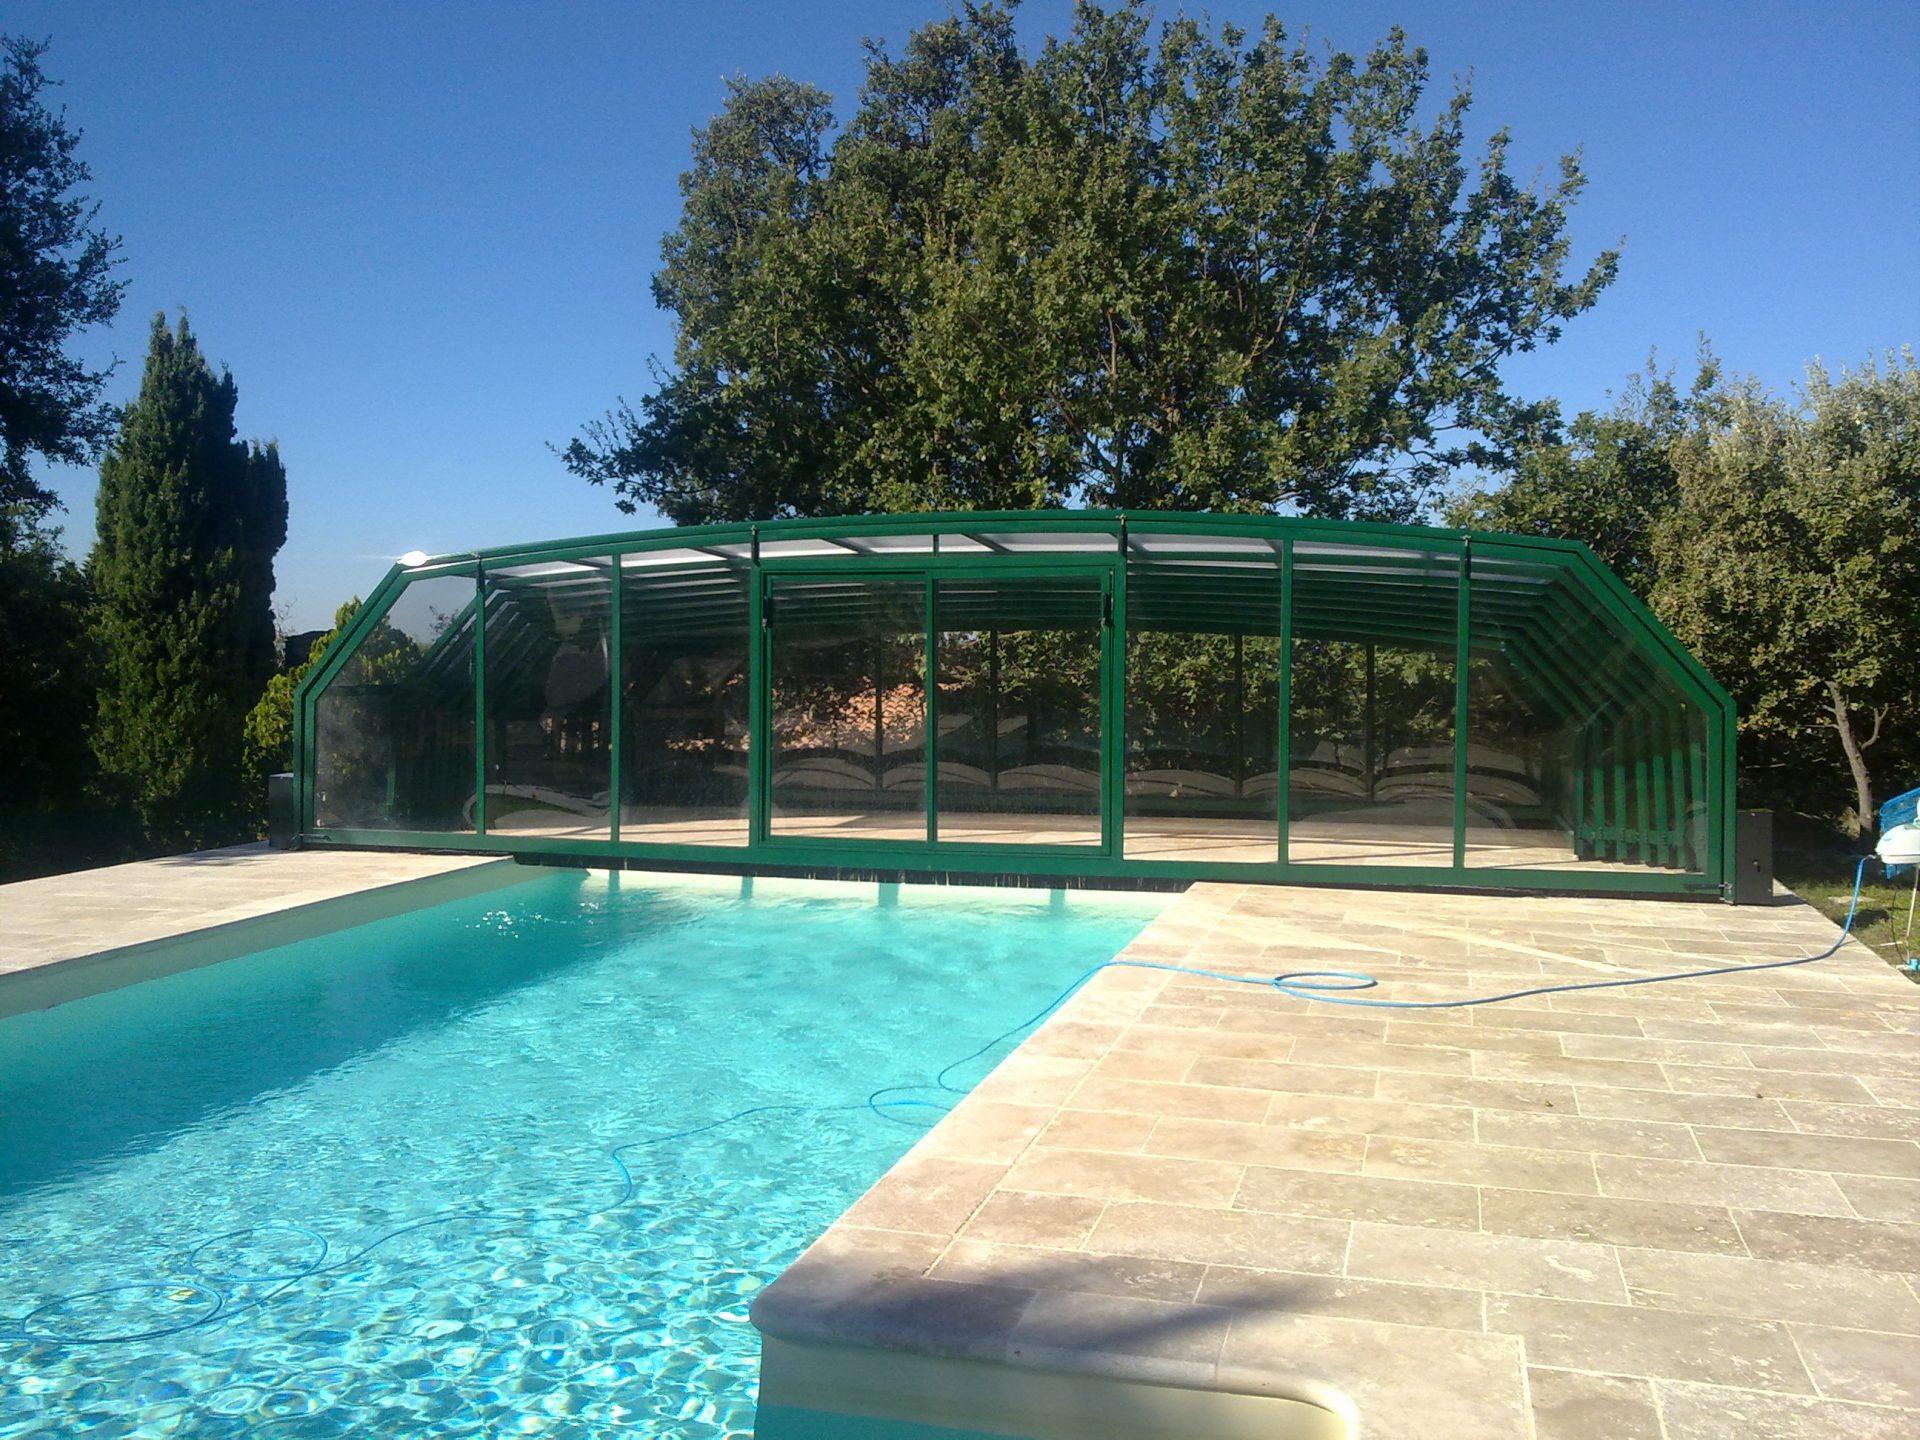 abri piscine sur mesure les mod les bel abri. Black Bedroom Furniture Sets. Home Design Ideas